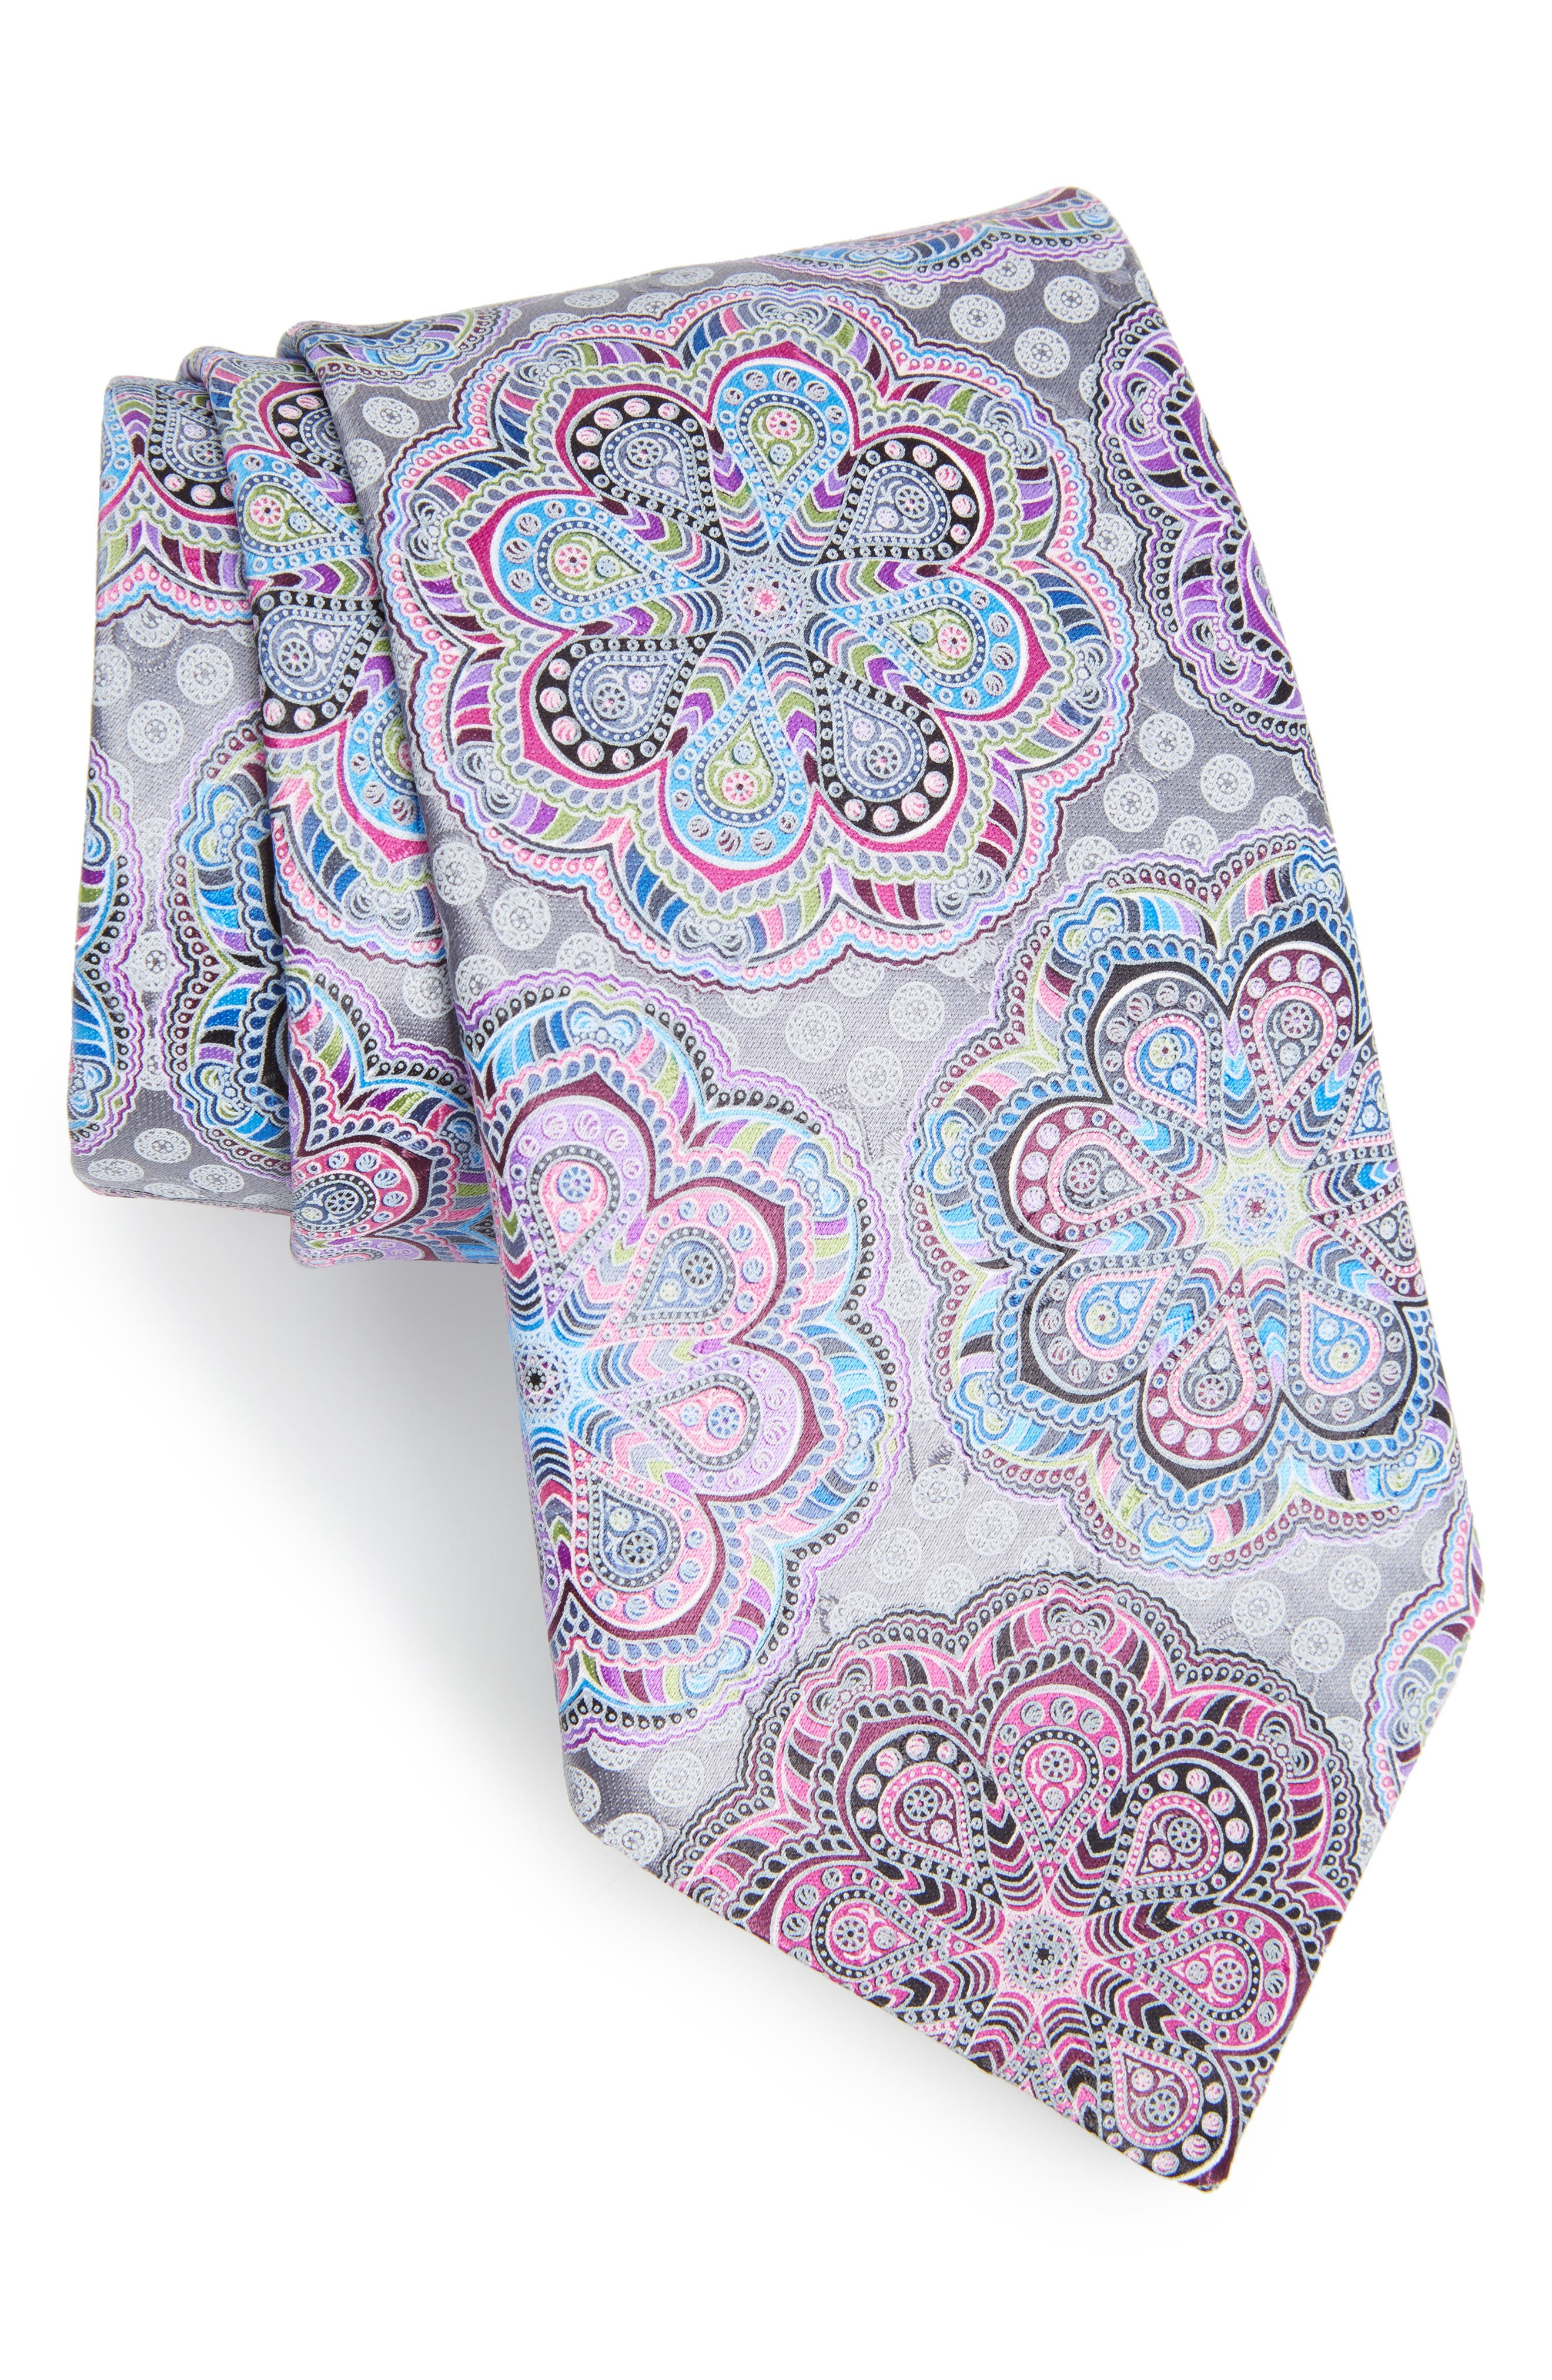 Main Image - Ermenegildo Zegna Medallion Woven Silk Tie